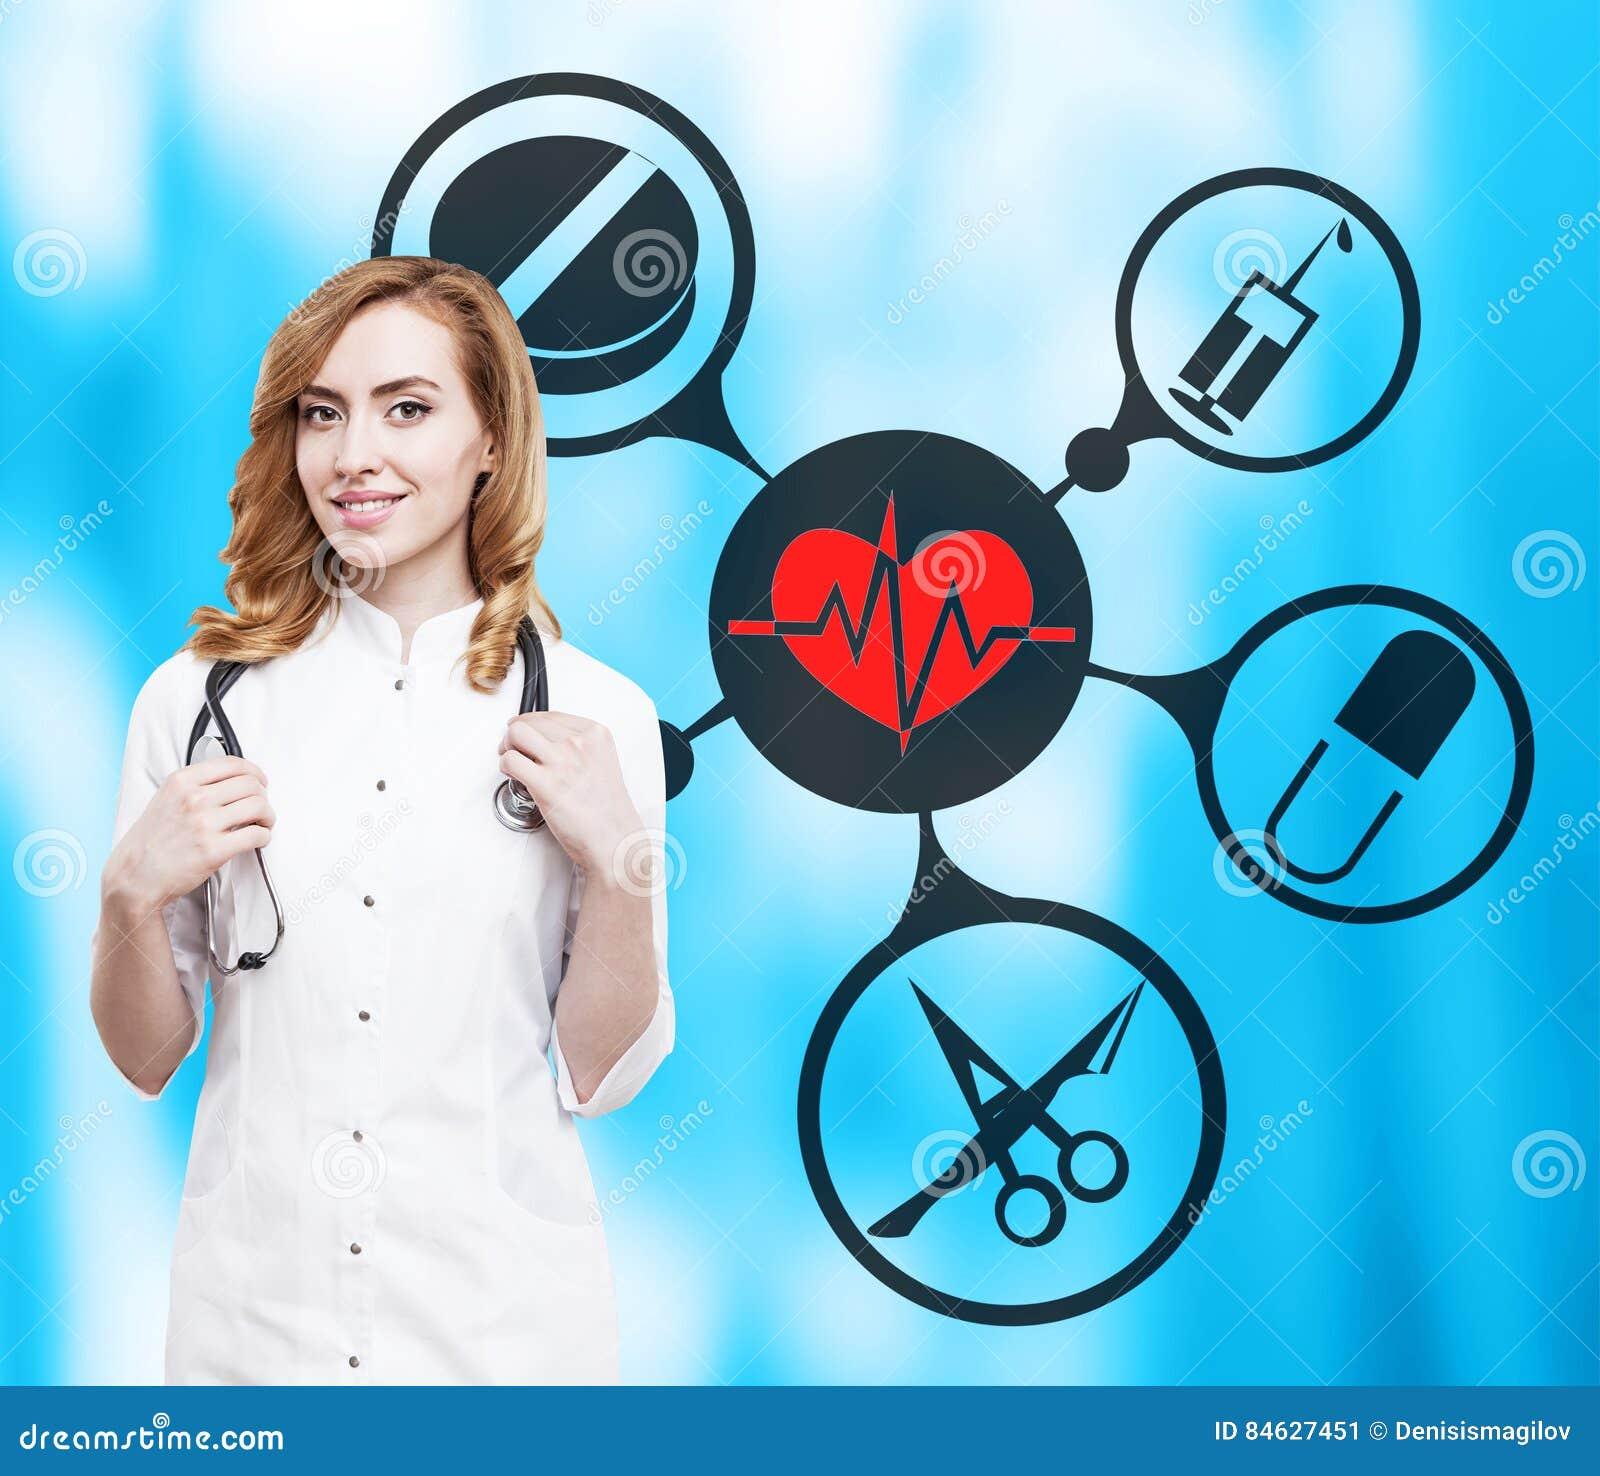 Woman doctor and medical icons on blue stock image image 84627451 royalty free stock photo buycottarizona